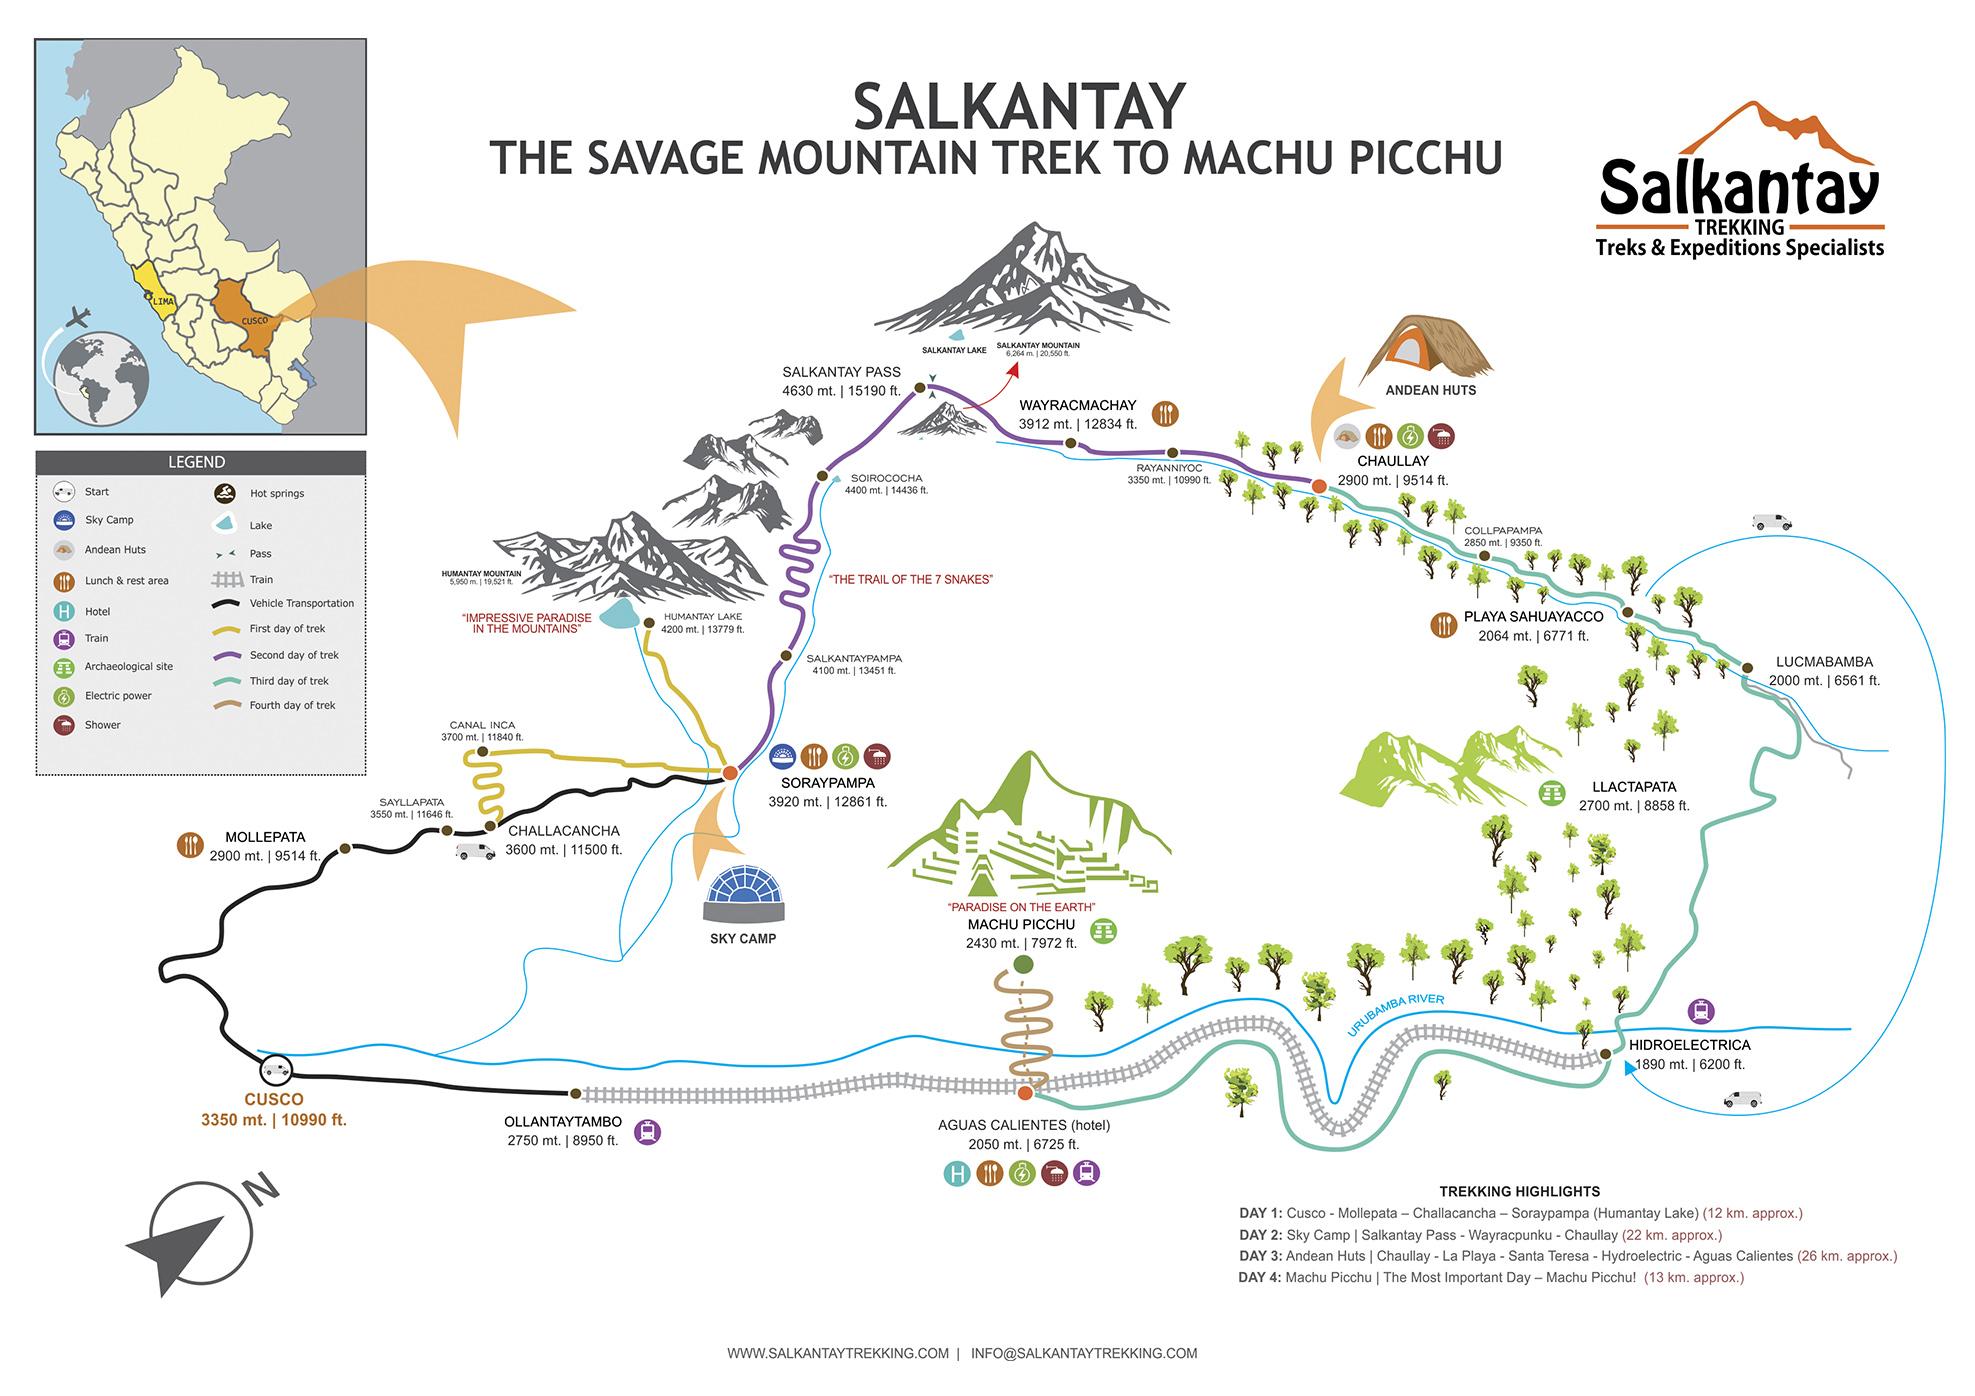 Map of our Salkantay Trek route to Machu Picchu, Perú.